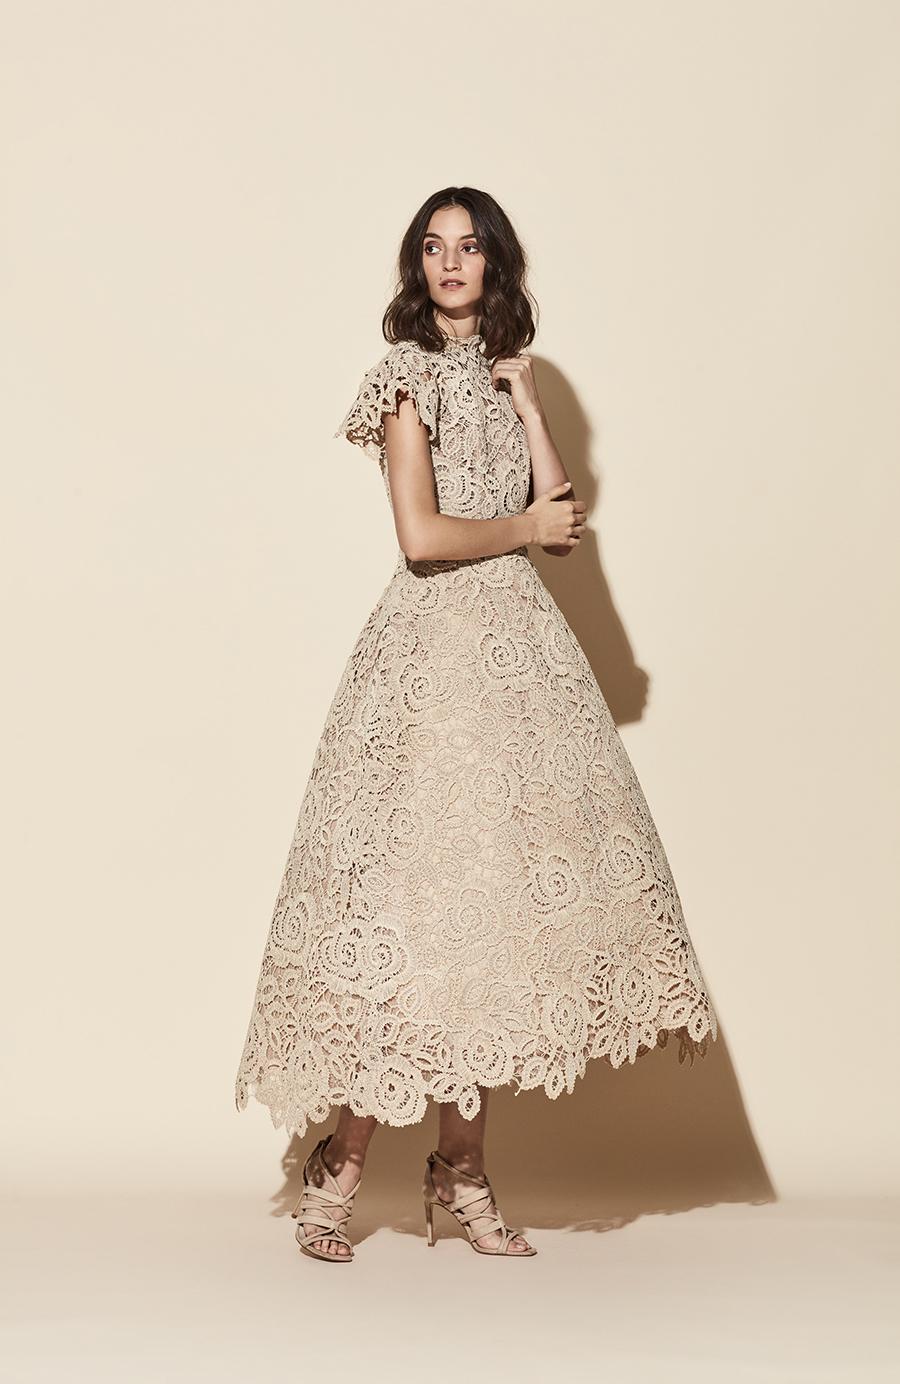 20-42 yolancris evening party cocktail dress modest beige embroidery vestido fiesta gala princesa princess